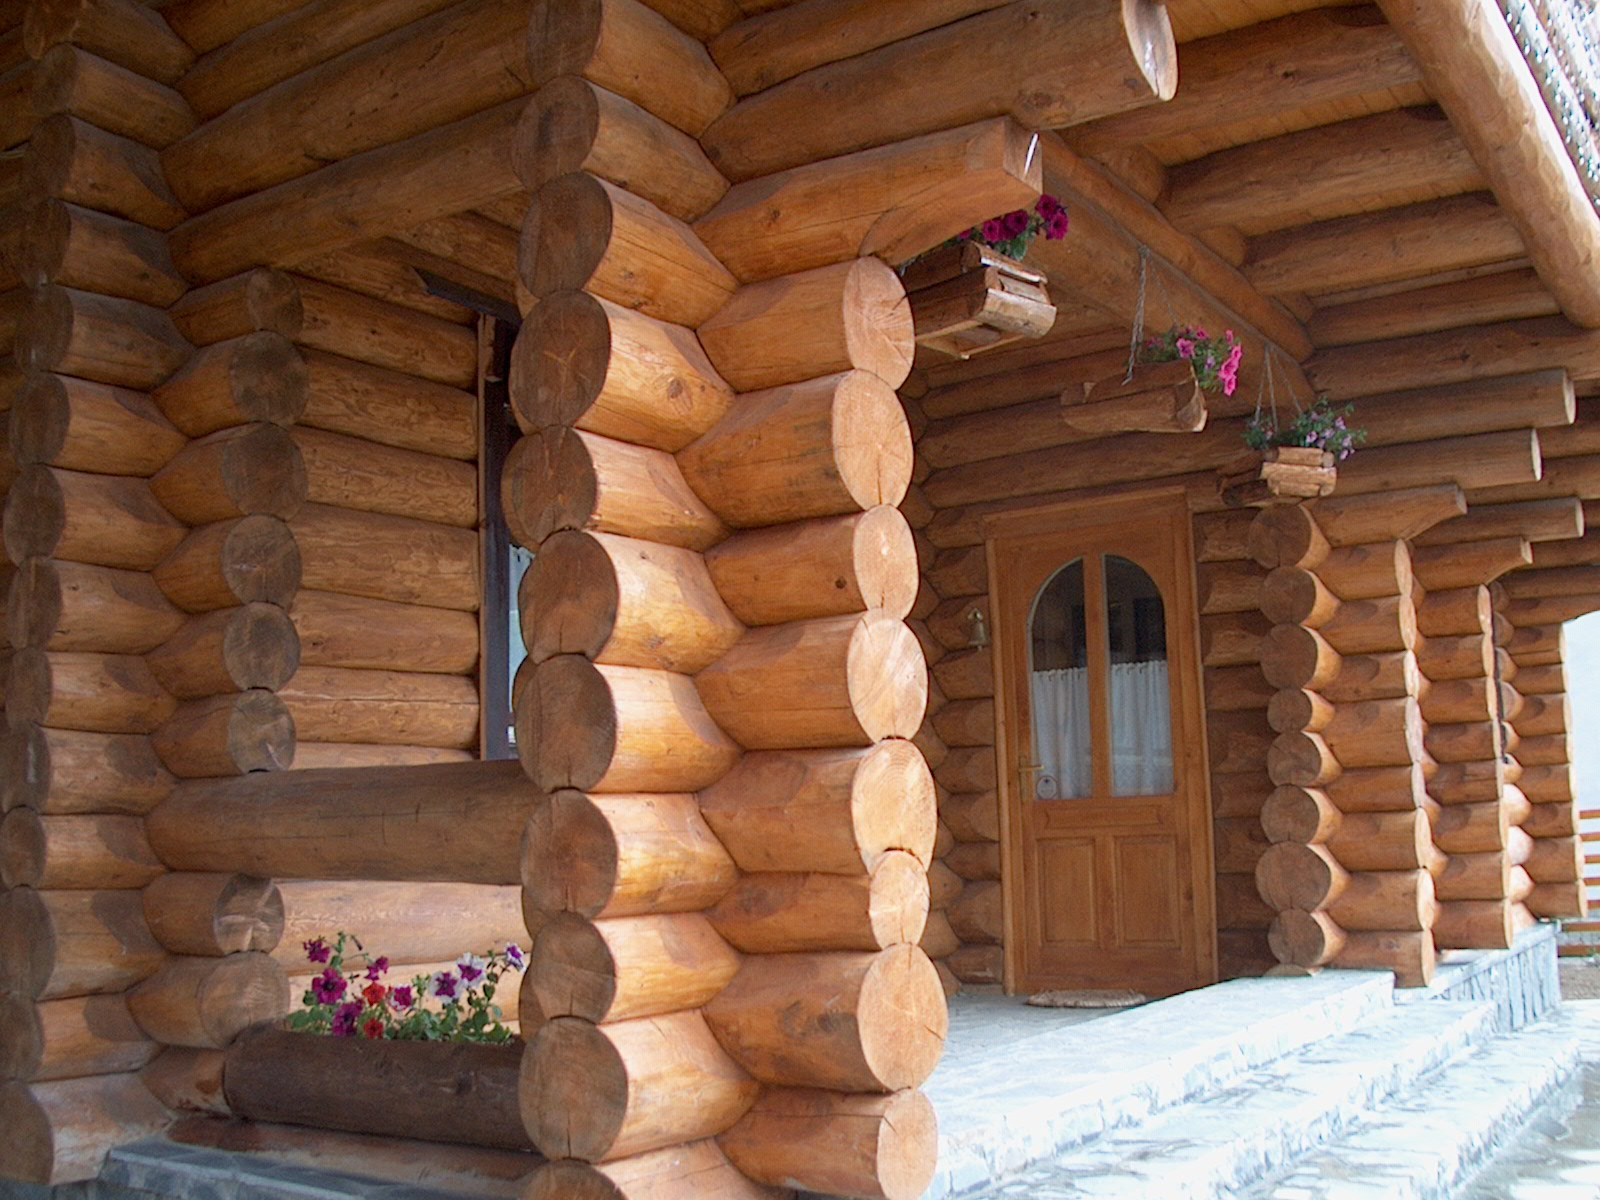 Case din lemn rotund NATURAL LIVING - Poza 15